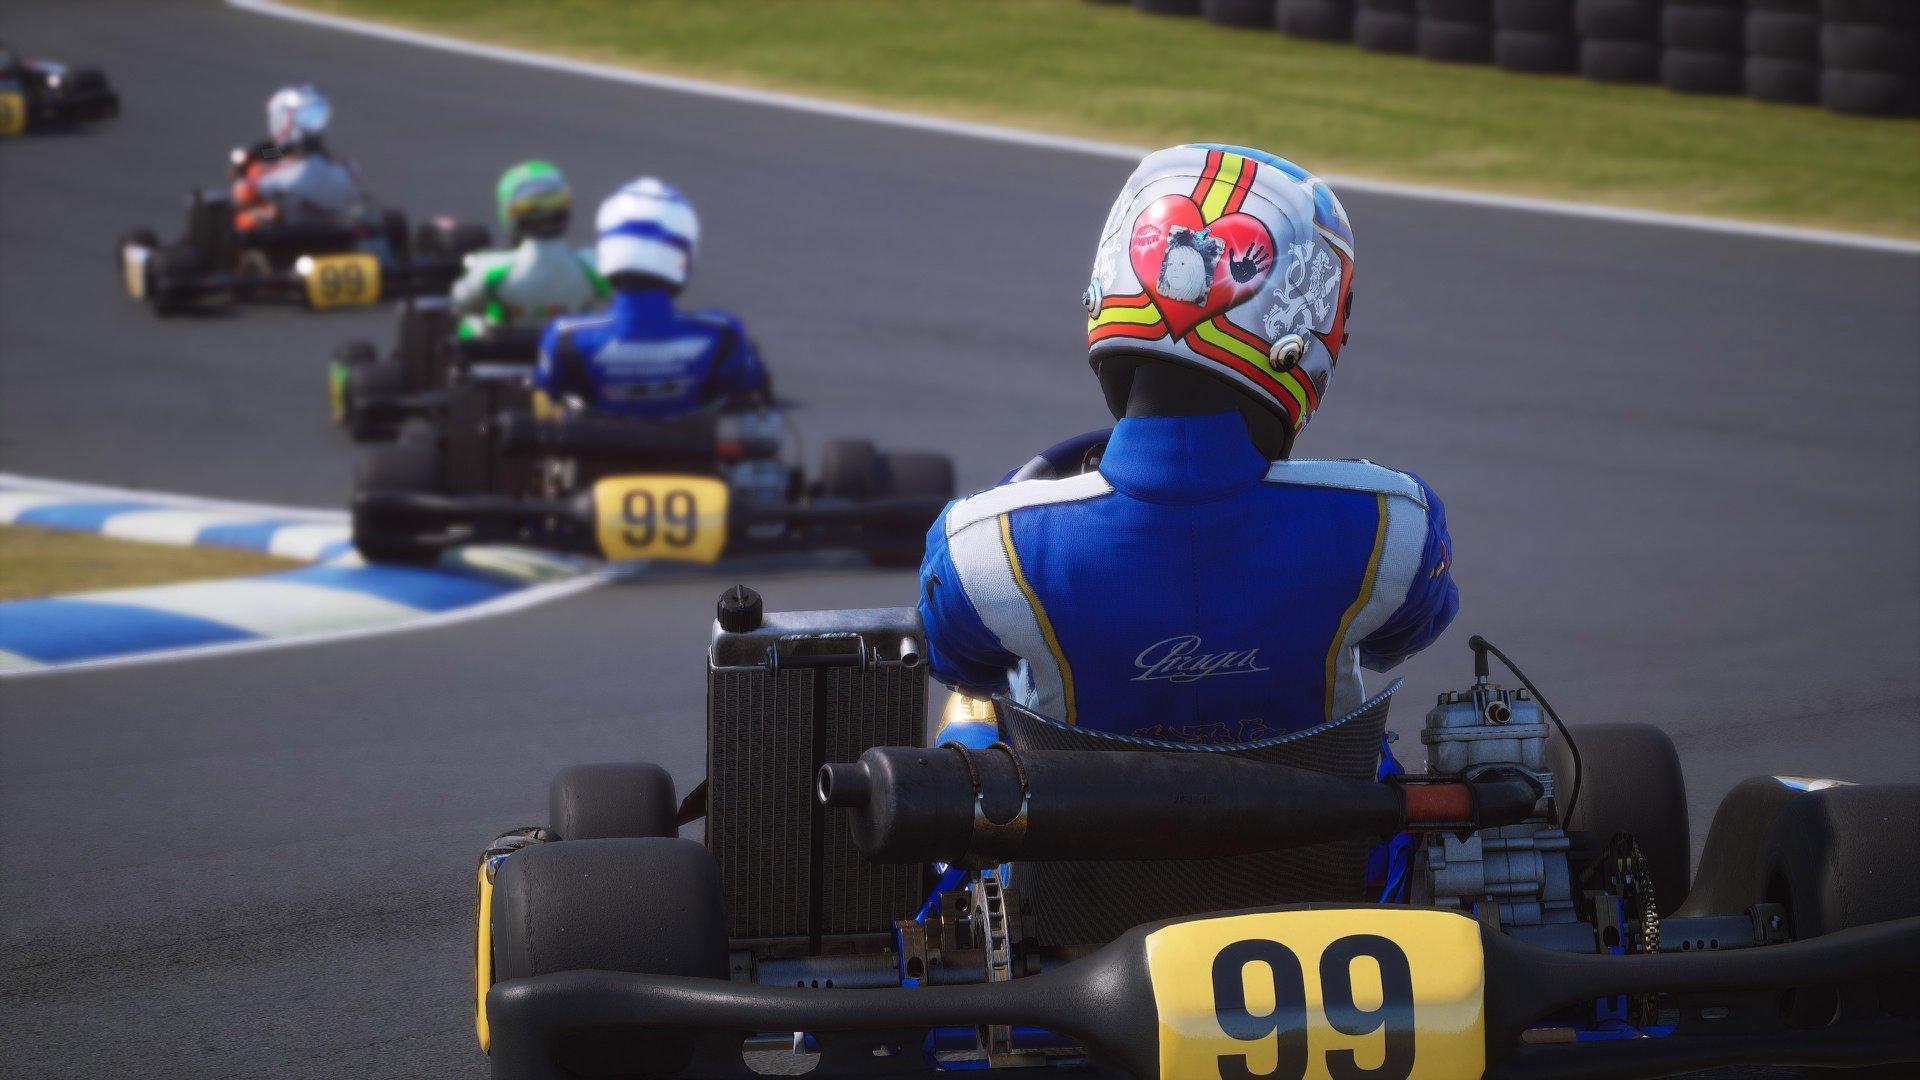 KartKraft - Atlanta Motorsports Park 2.jpg